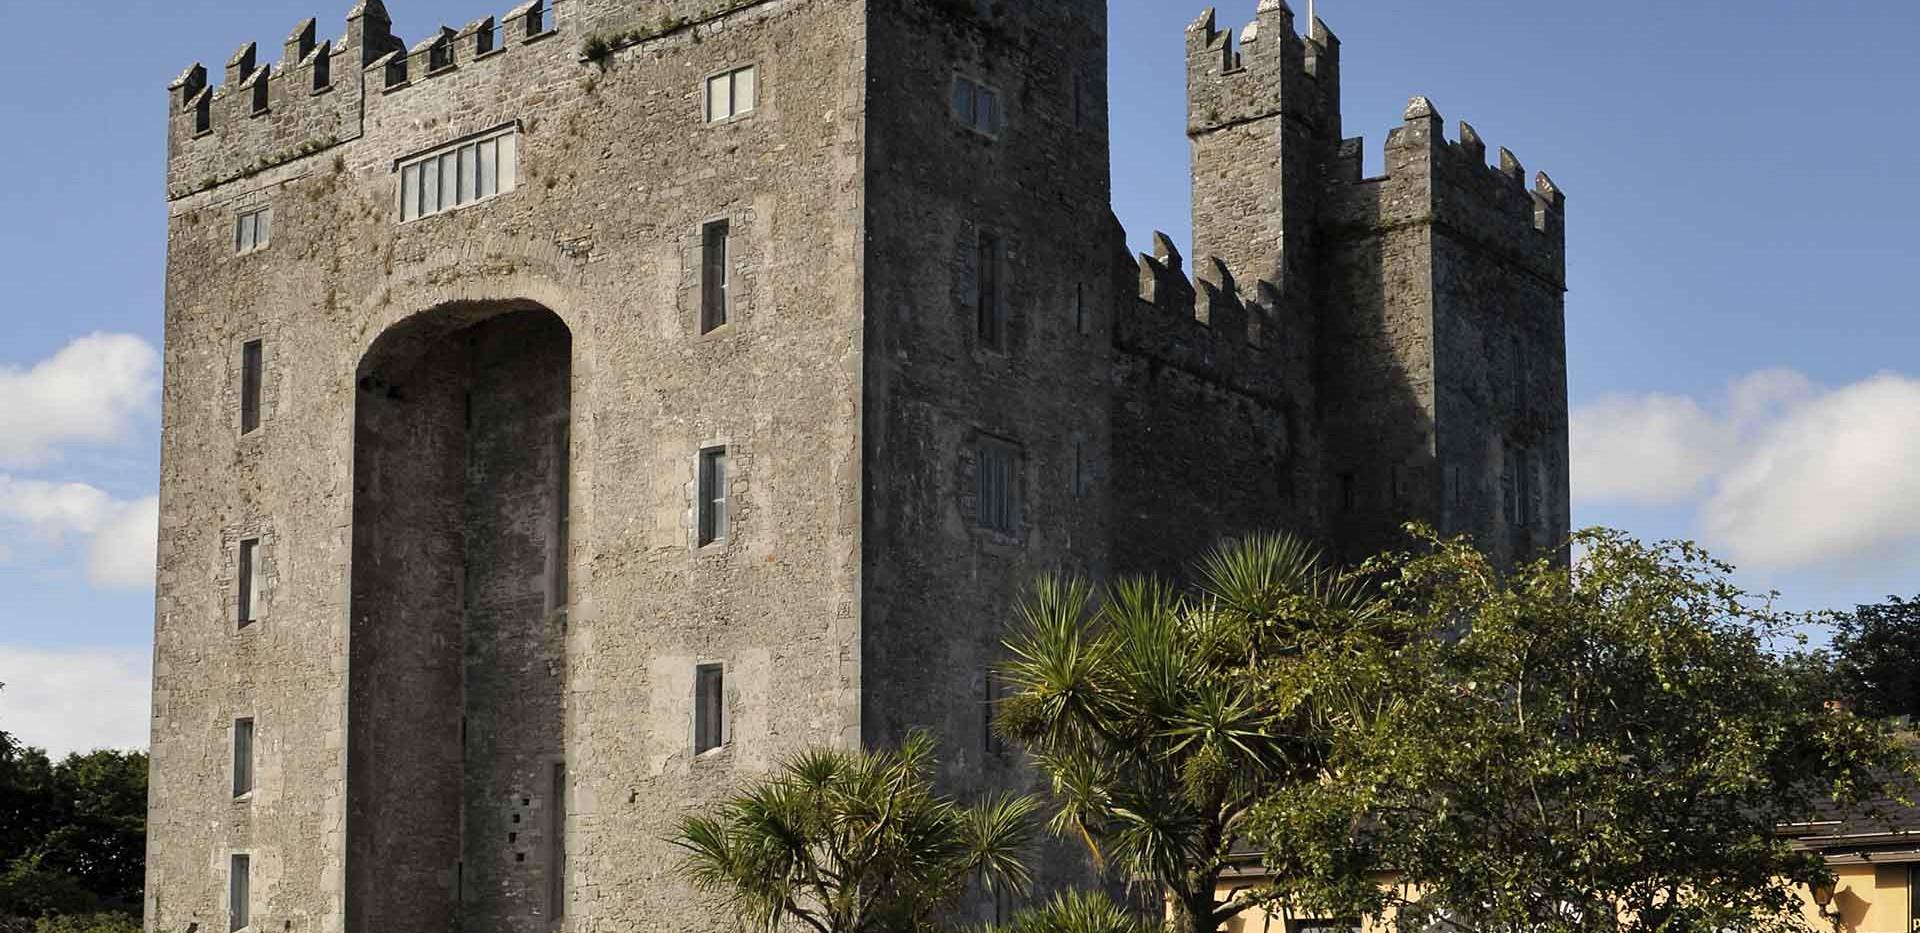 snn-dev-bunratty-castle-3.jpg